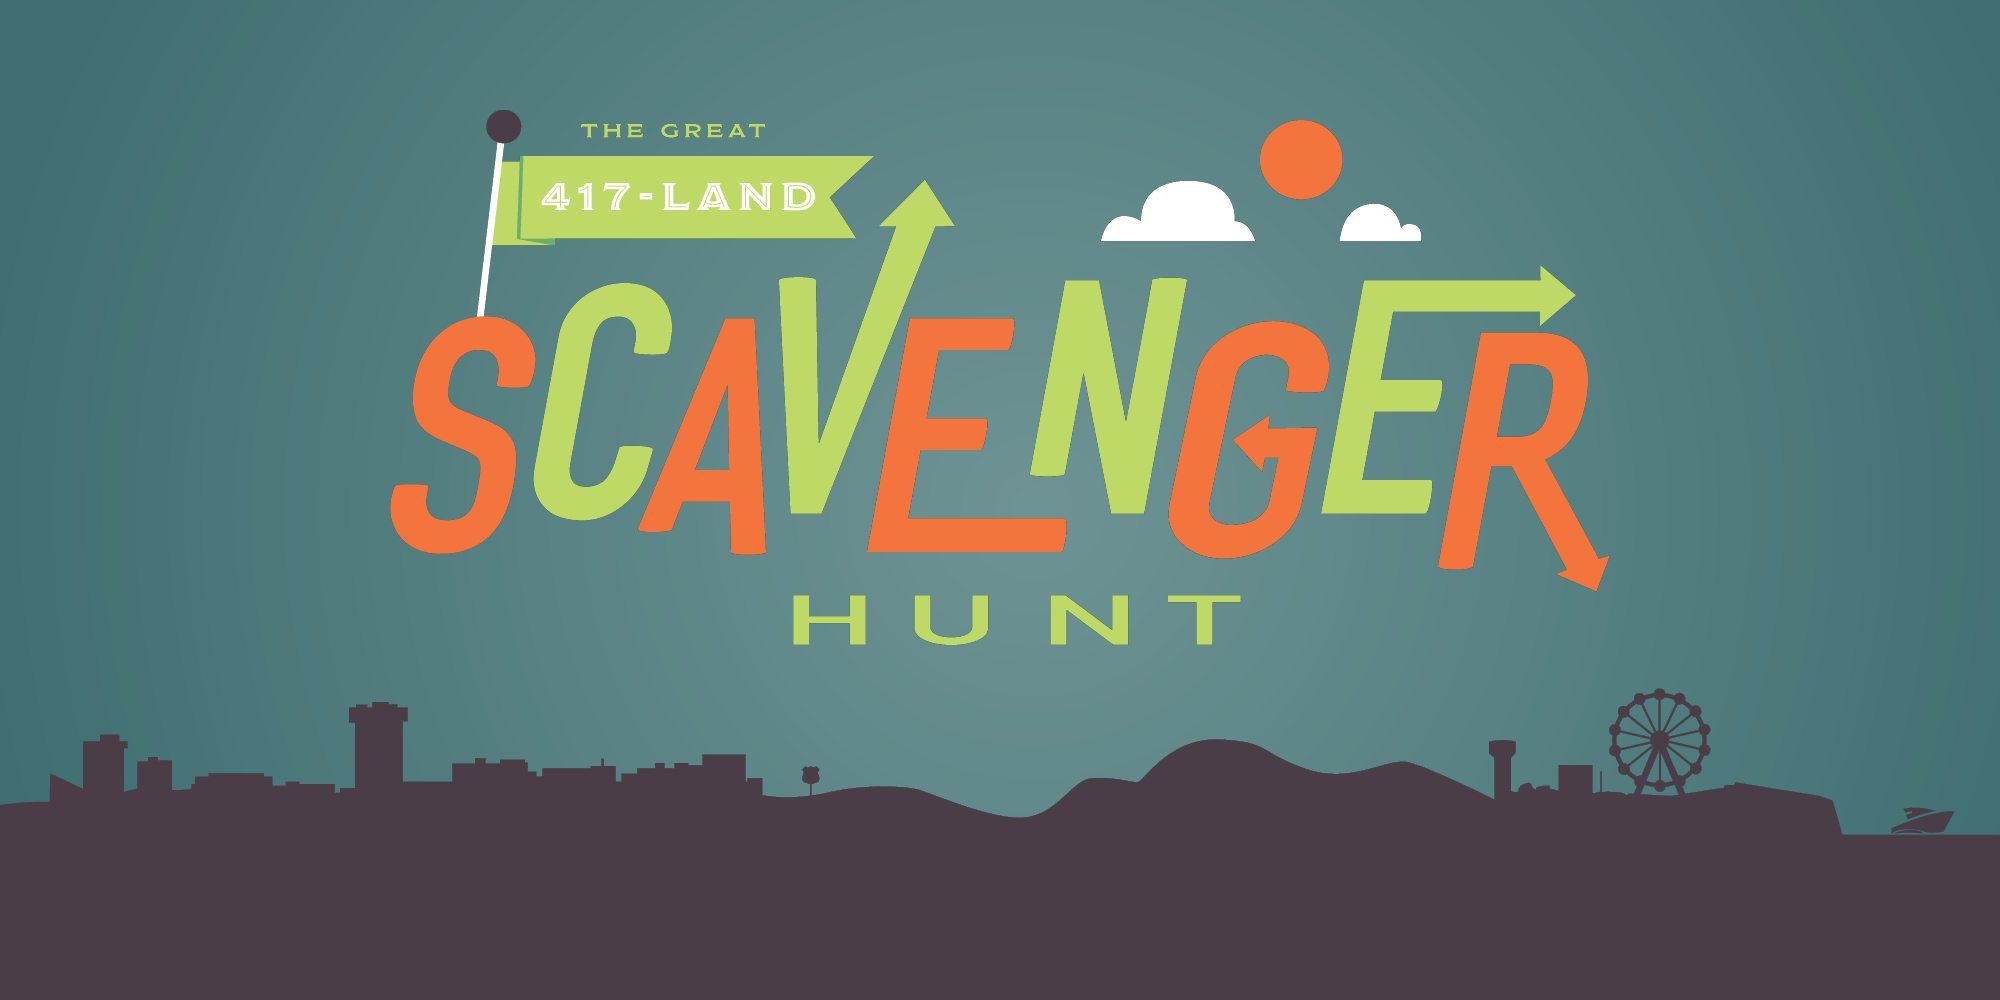 The Great 417-Land Scavenger Hunt